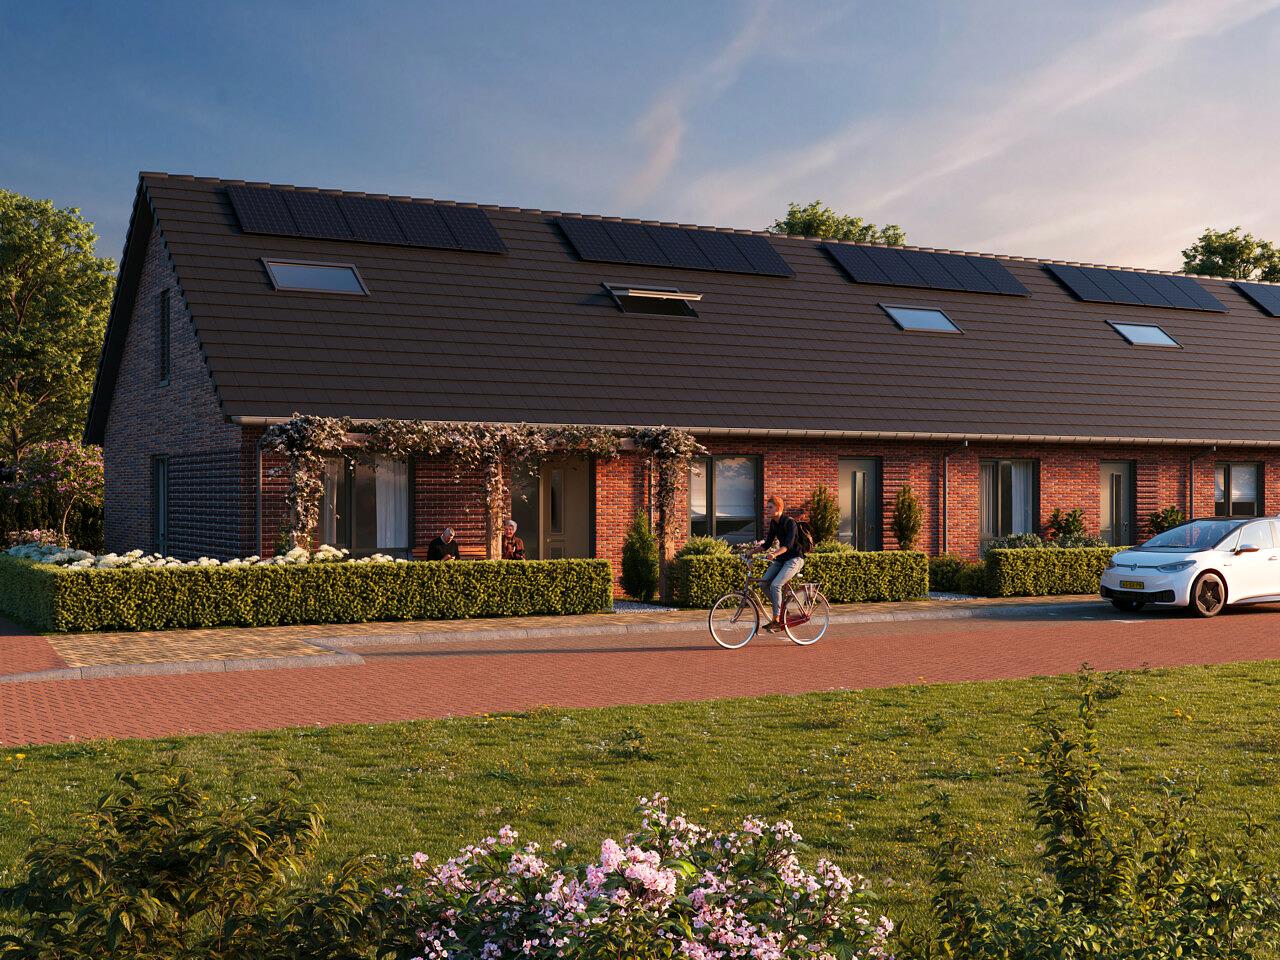 Thuis in Bloemendal Barneveld A - Heilijgers